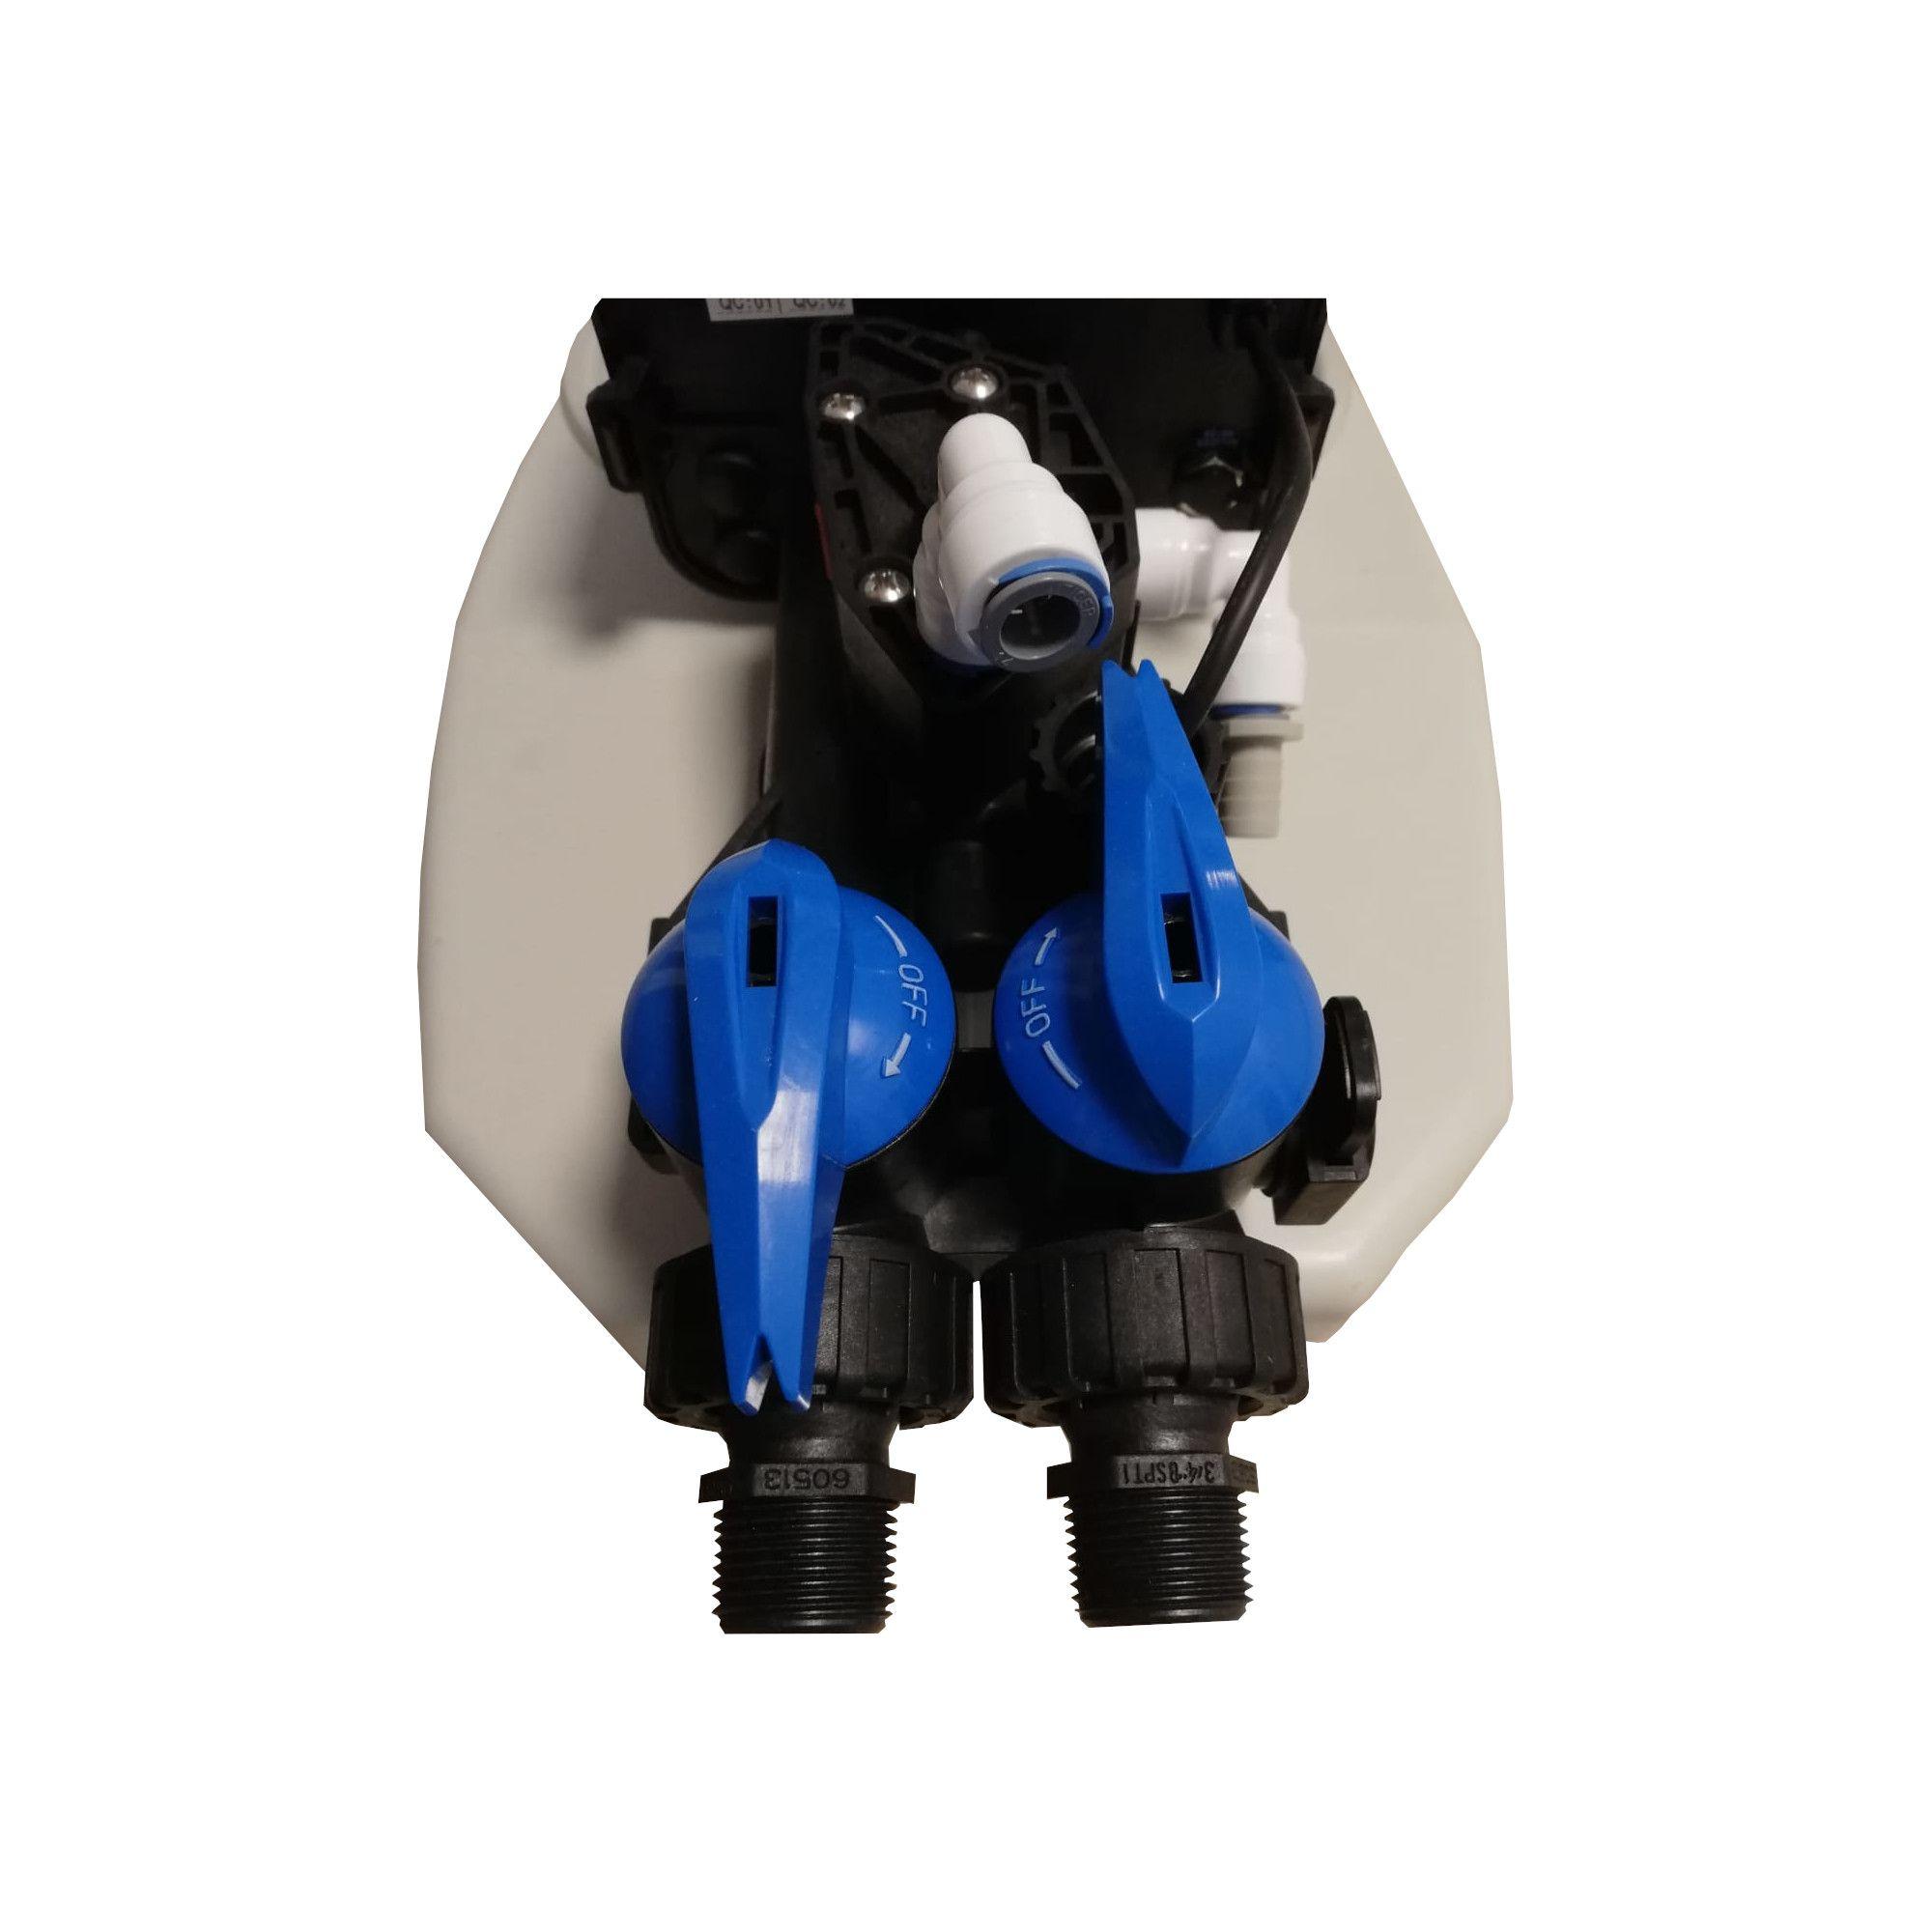 Dedurizator apa Aqua Mini 5-S10C, Debit 0.3 mc/h, Capacitate filtrare 2.600 litri, Cartus din Rasina Cationica - AquaFilters.ro